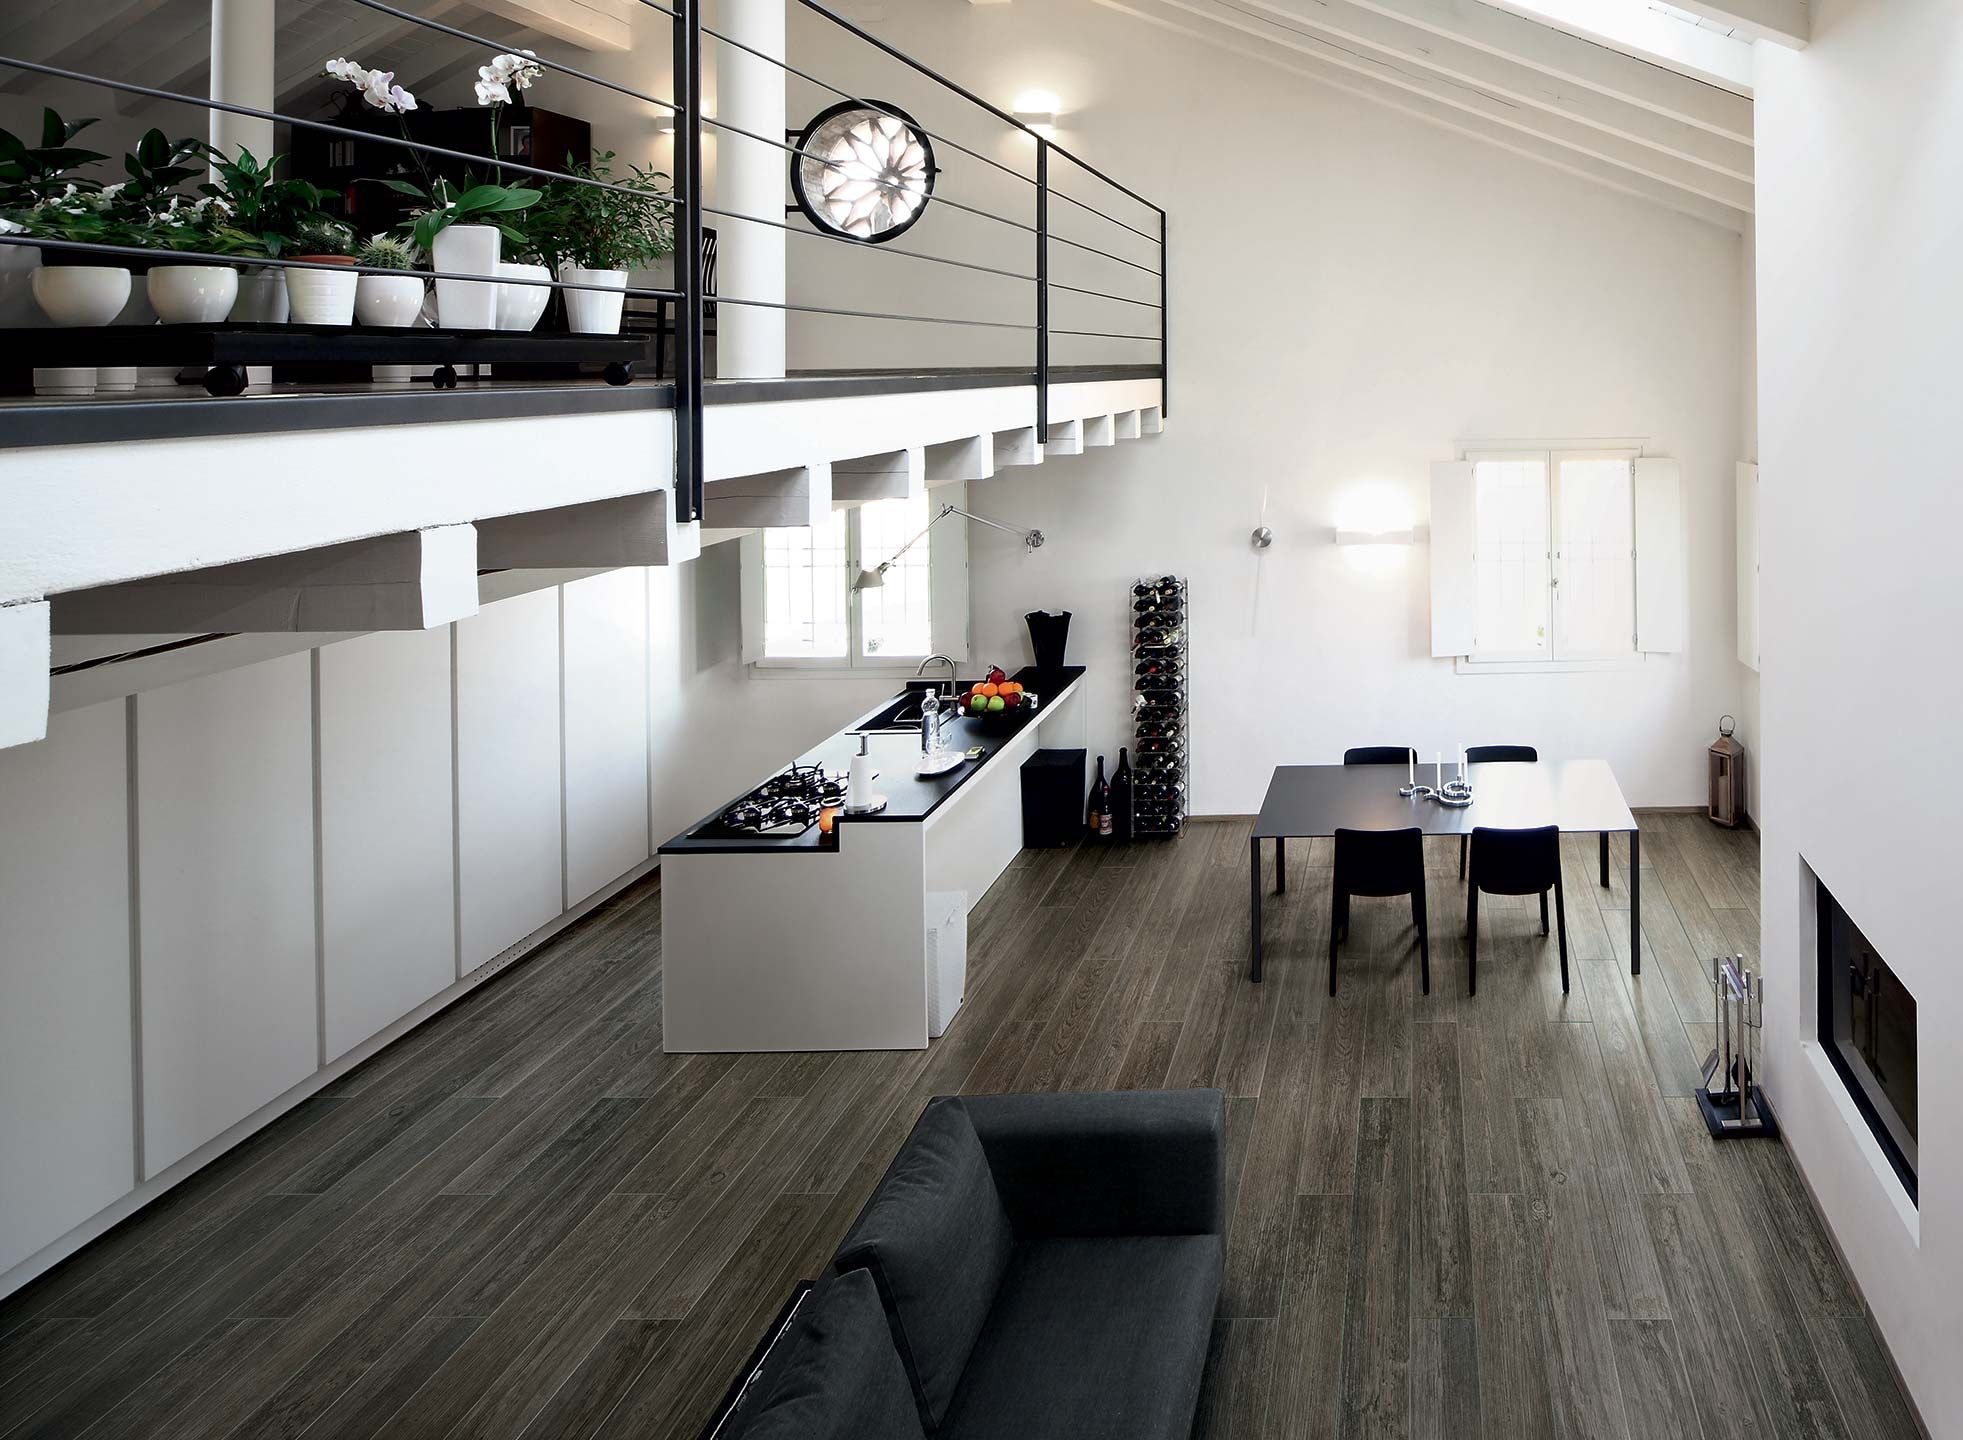 inspiration bois dans le salon avec du carrelage imitation. Black Bedroom Furniture Sets. Home Design Ideas